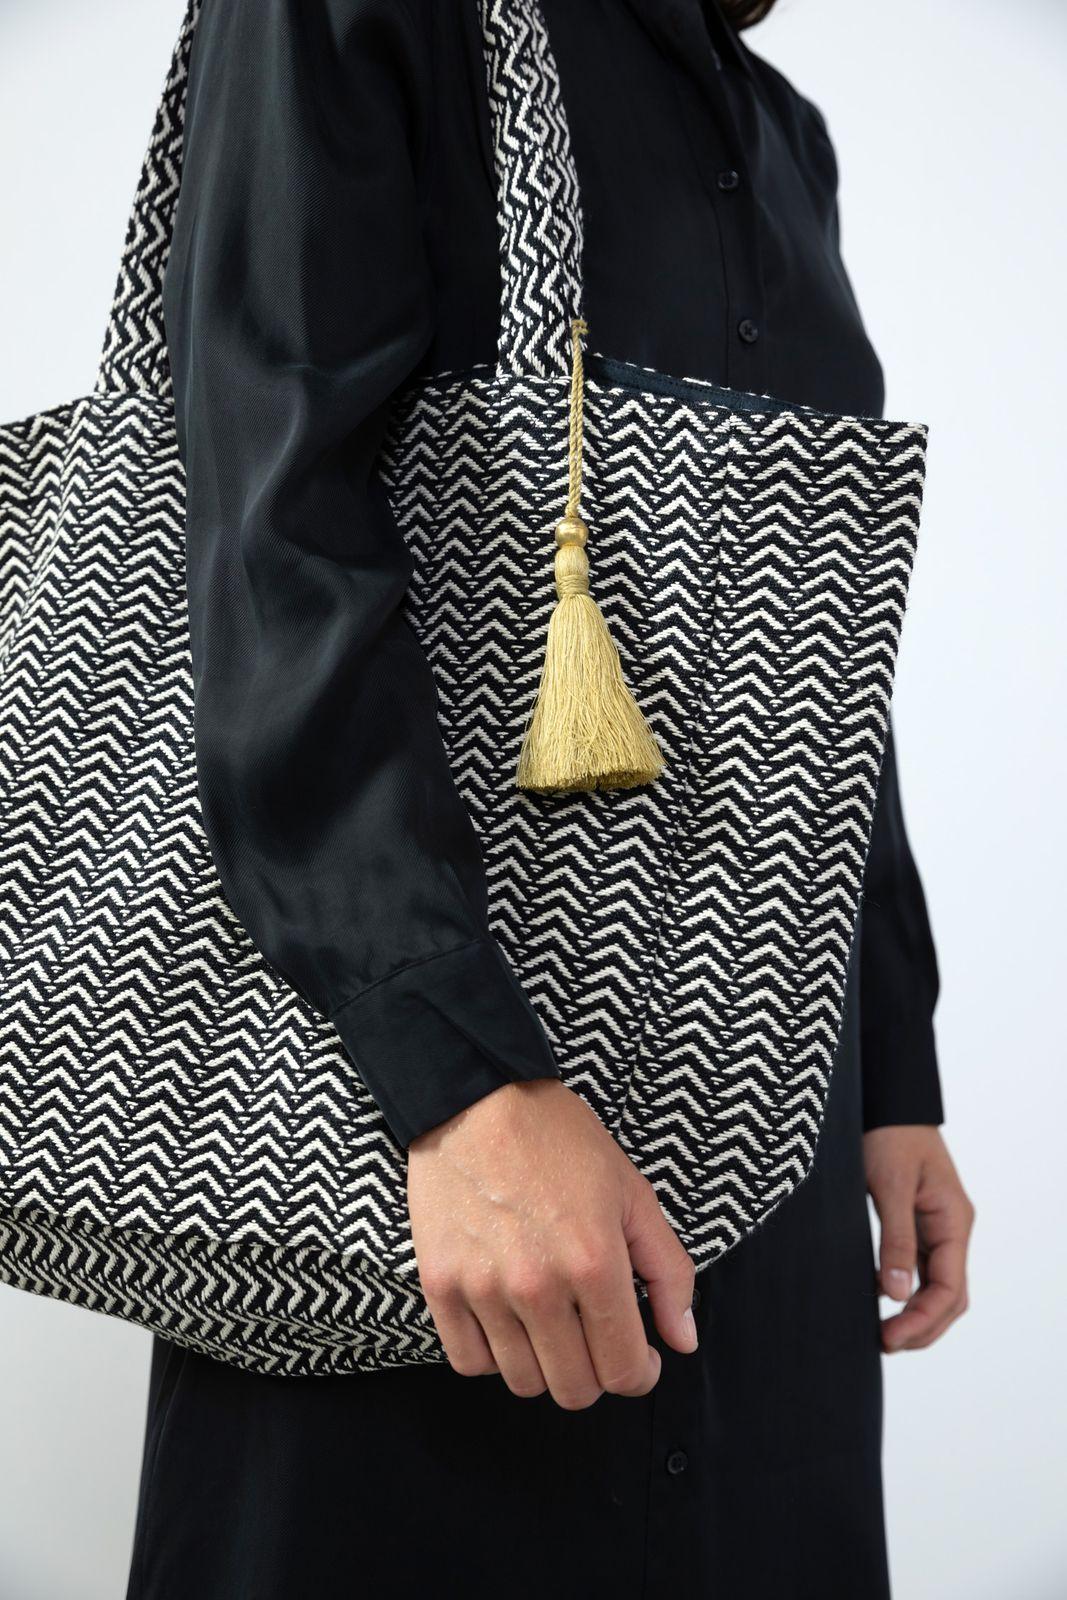 Zwart/witte strandtas met tassle